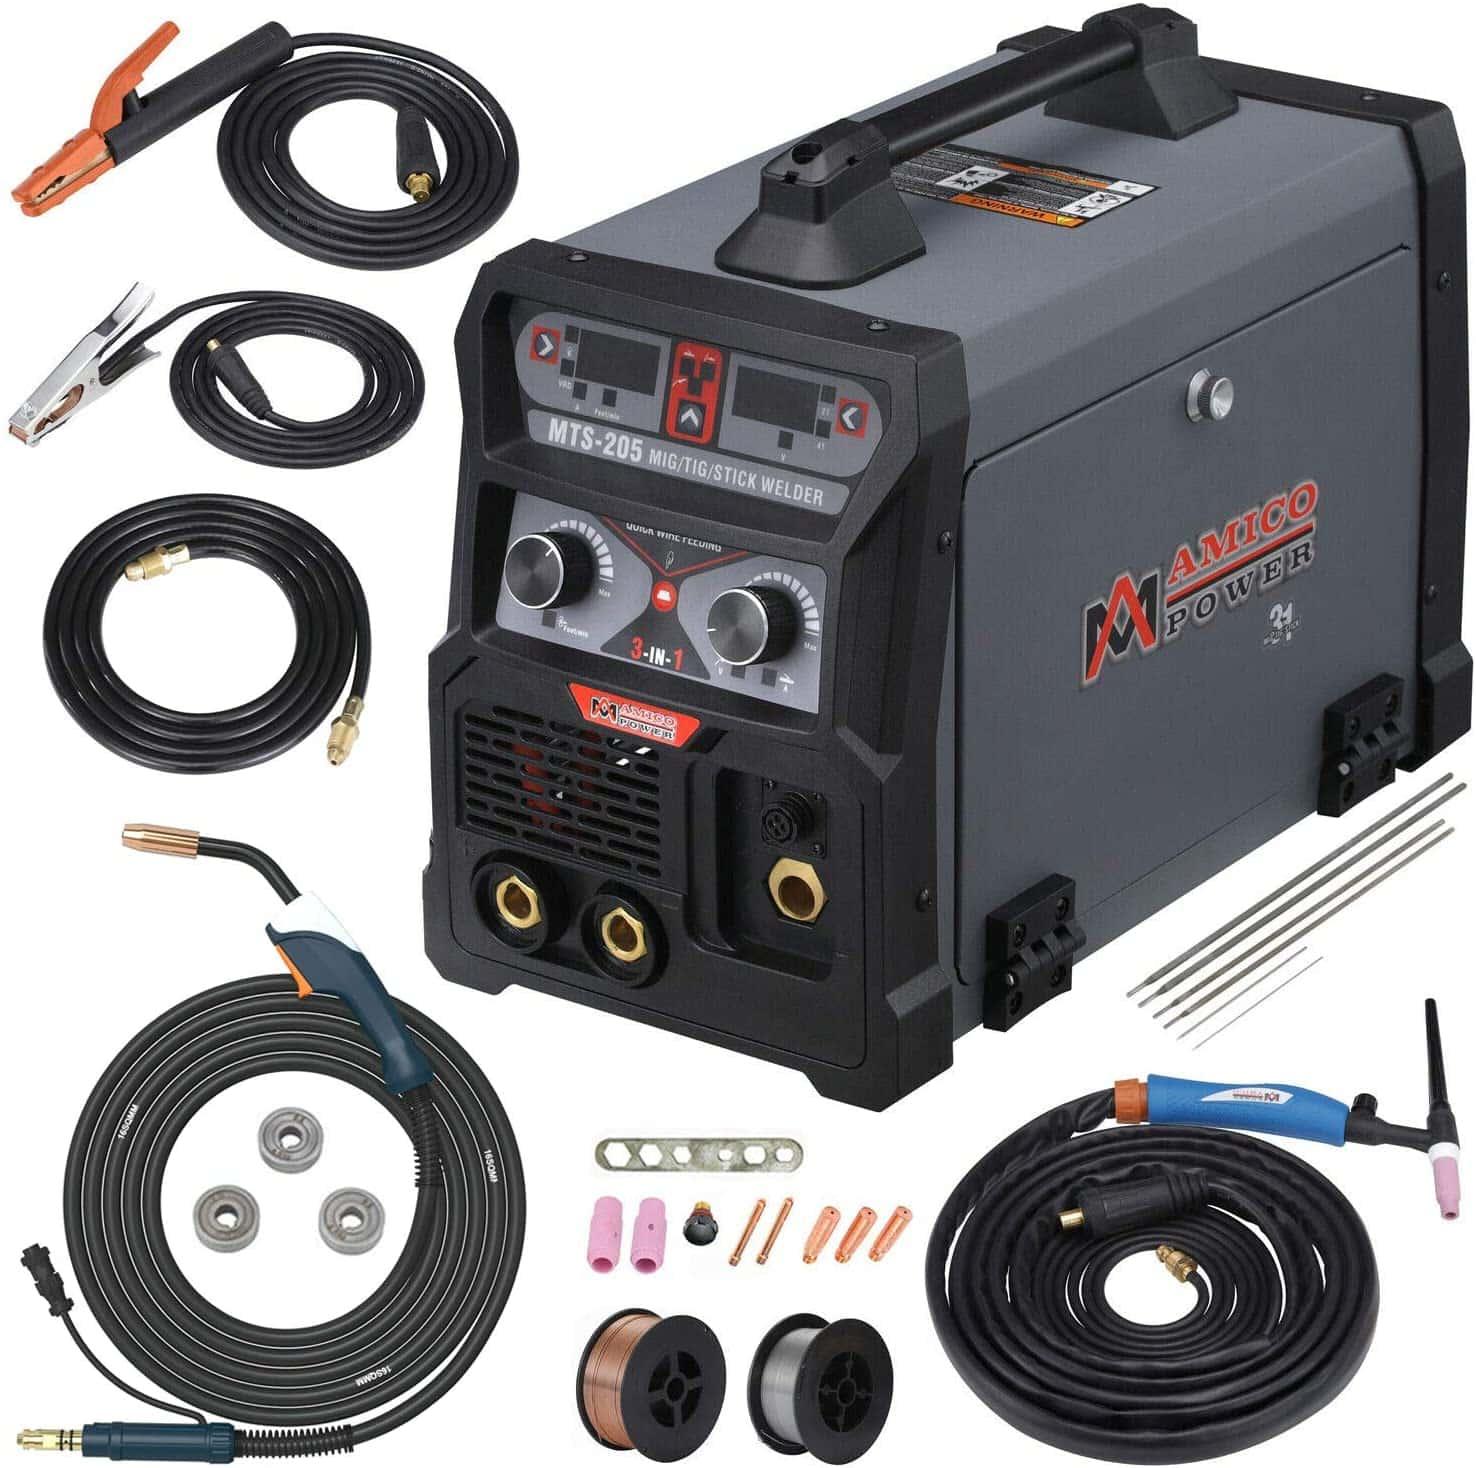 AmicoPower MTS-205 Combo Welder